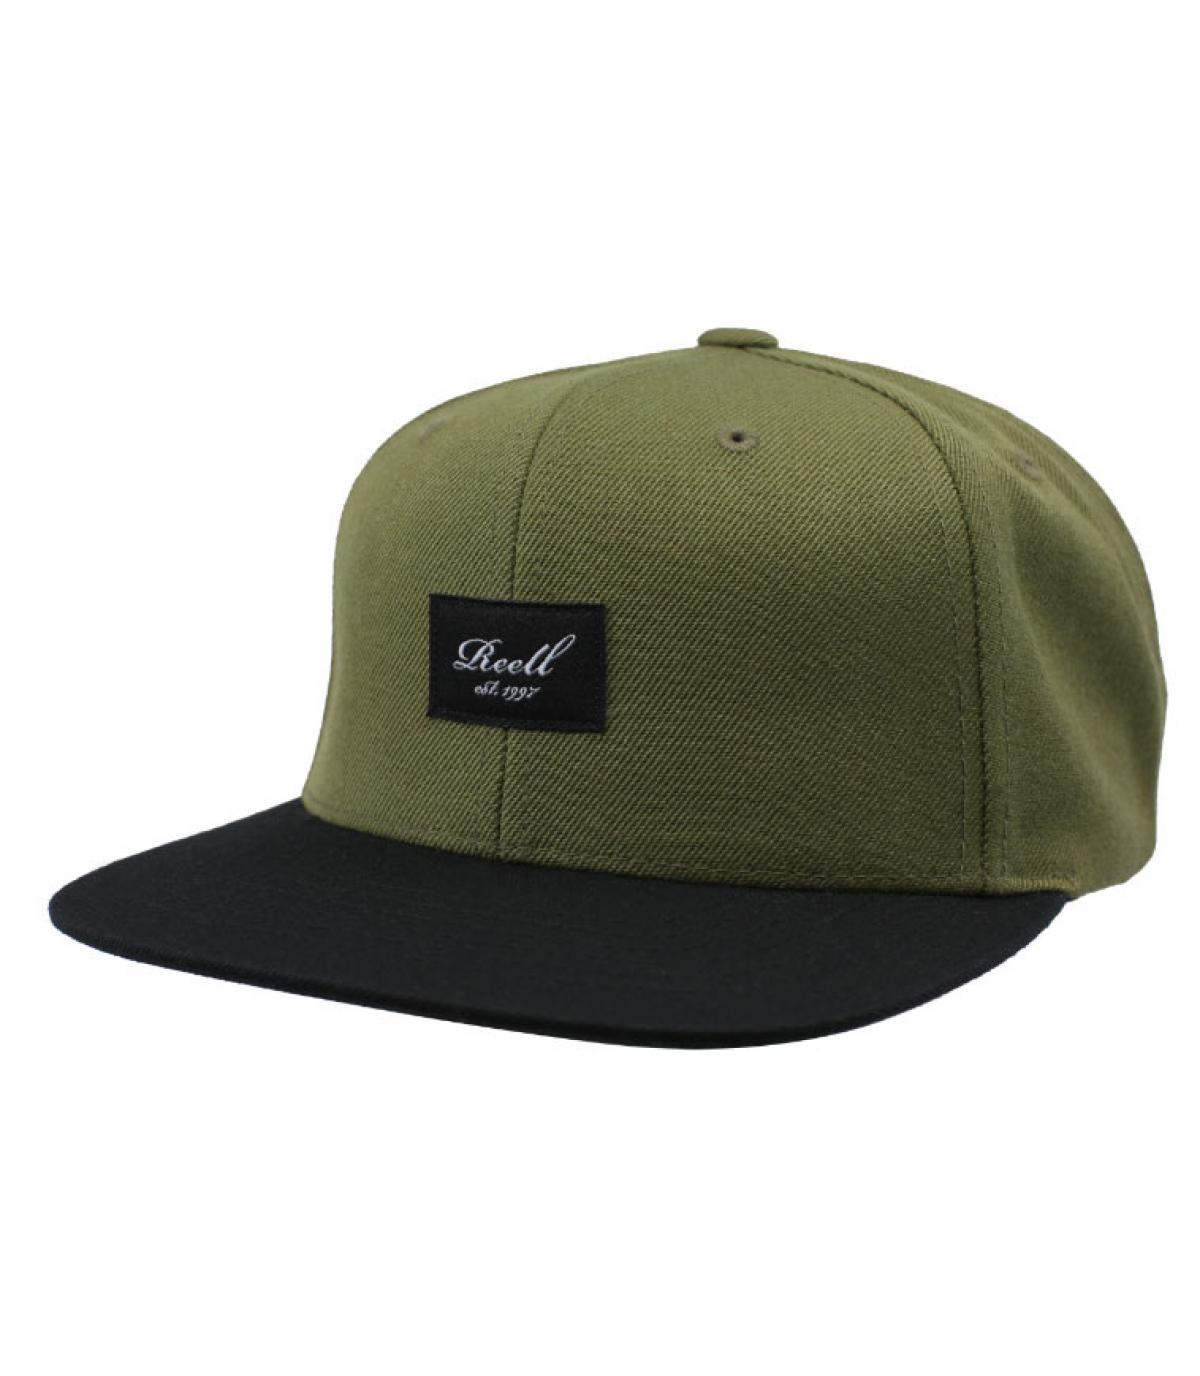 Reell black green snapback